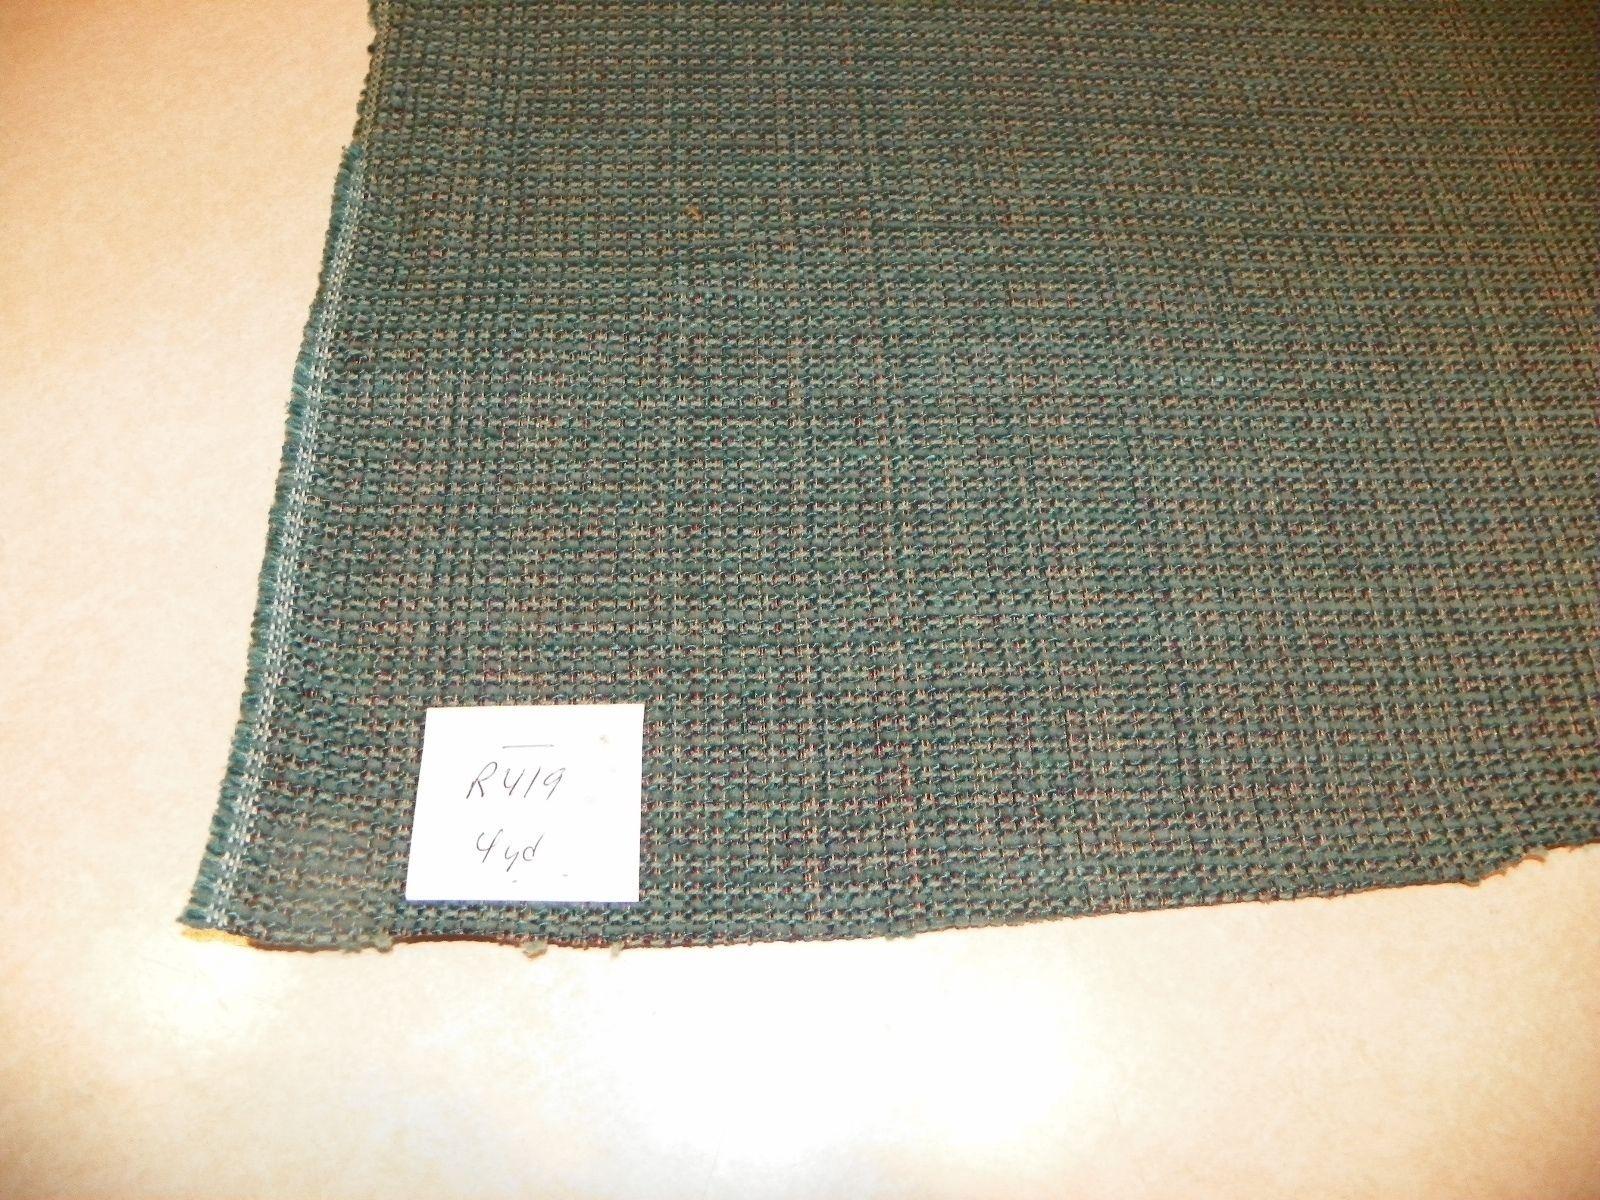 Blue Green Nylon Tweed Upholstery Fabric 1 Yard  R419